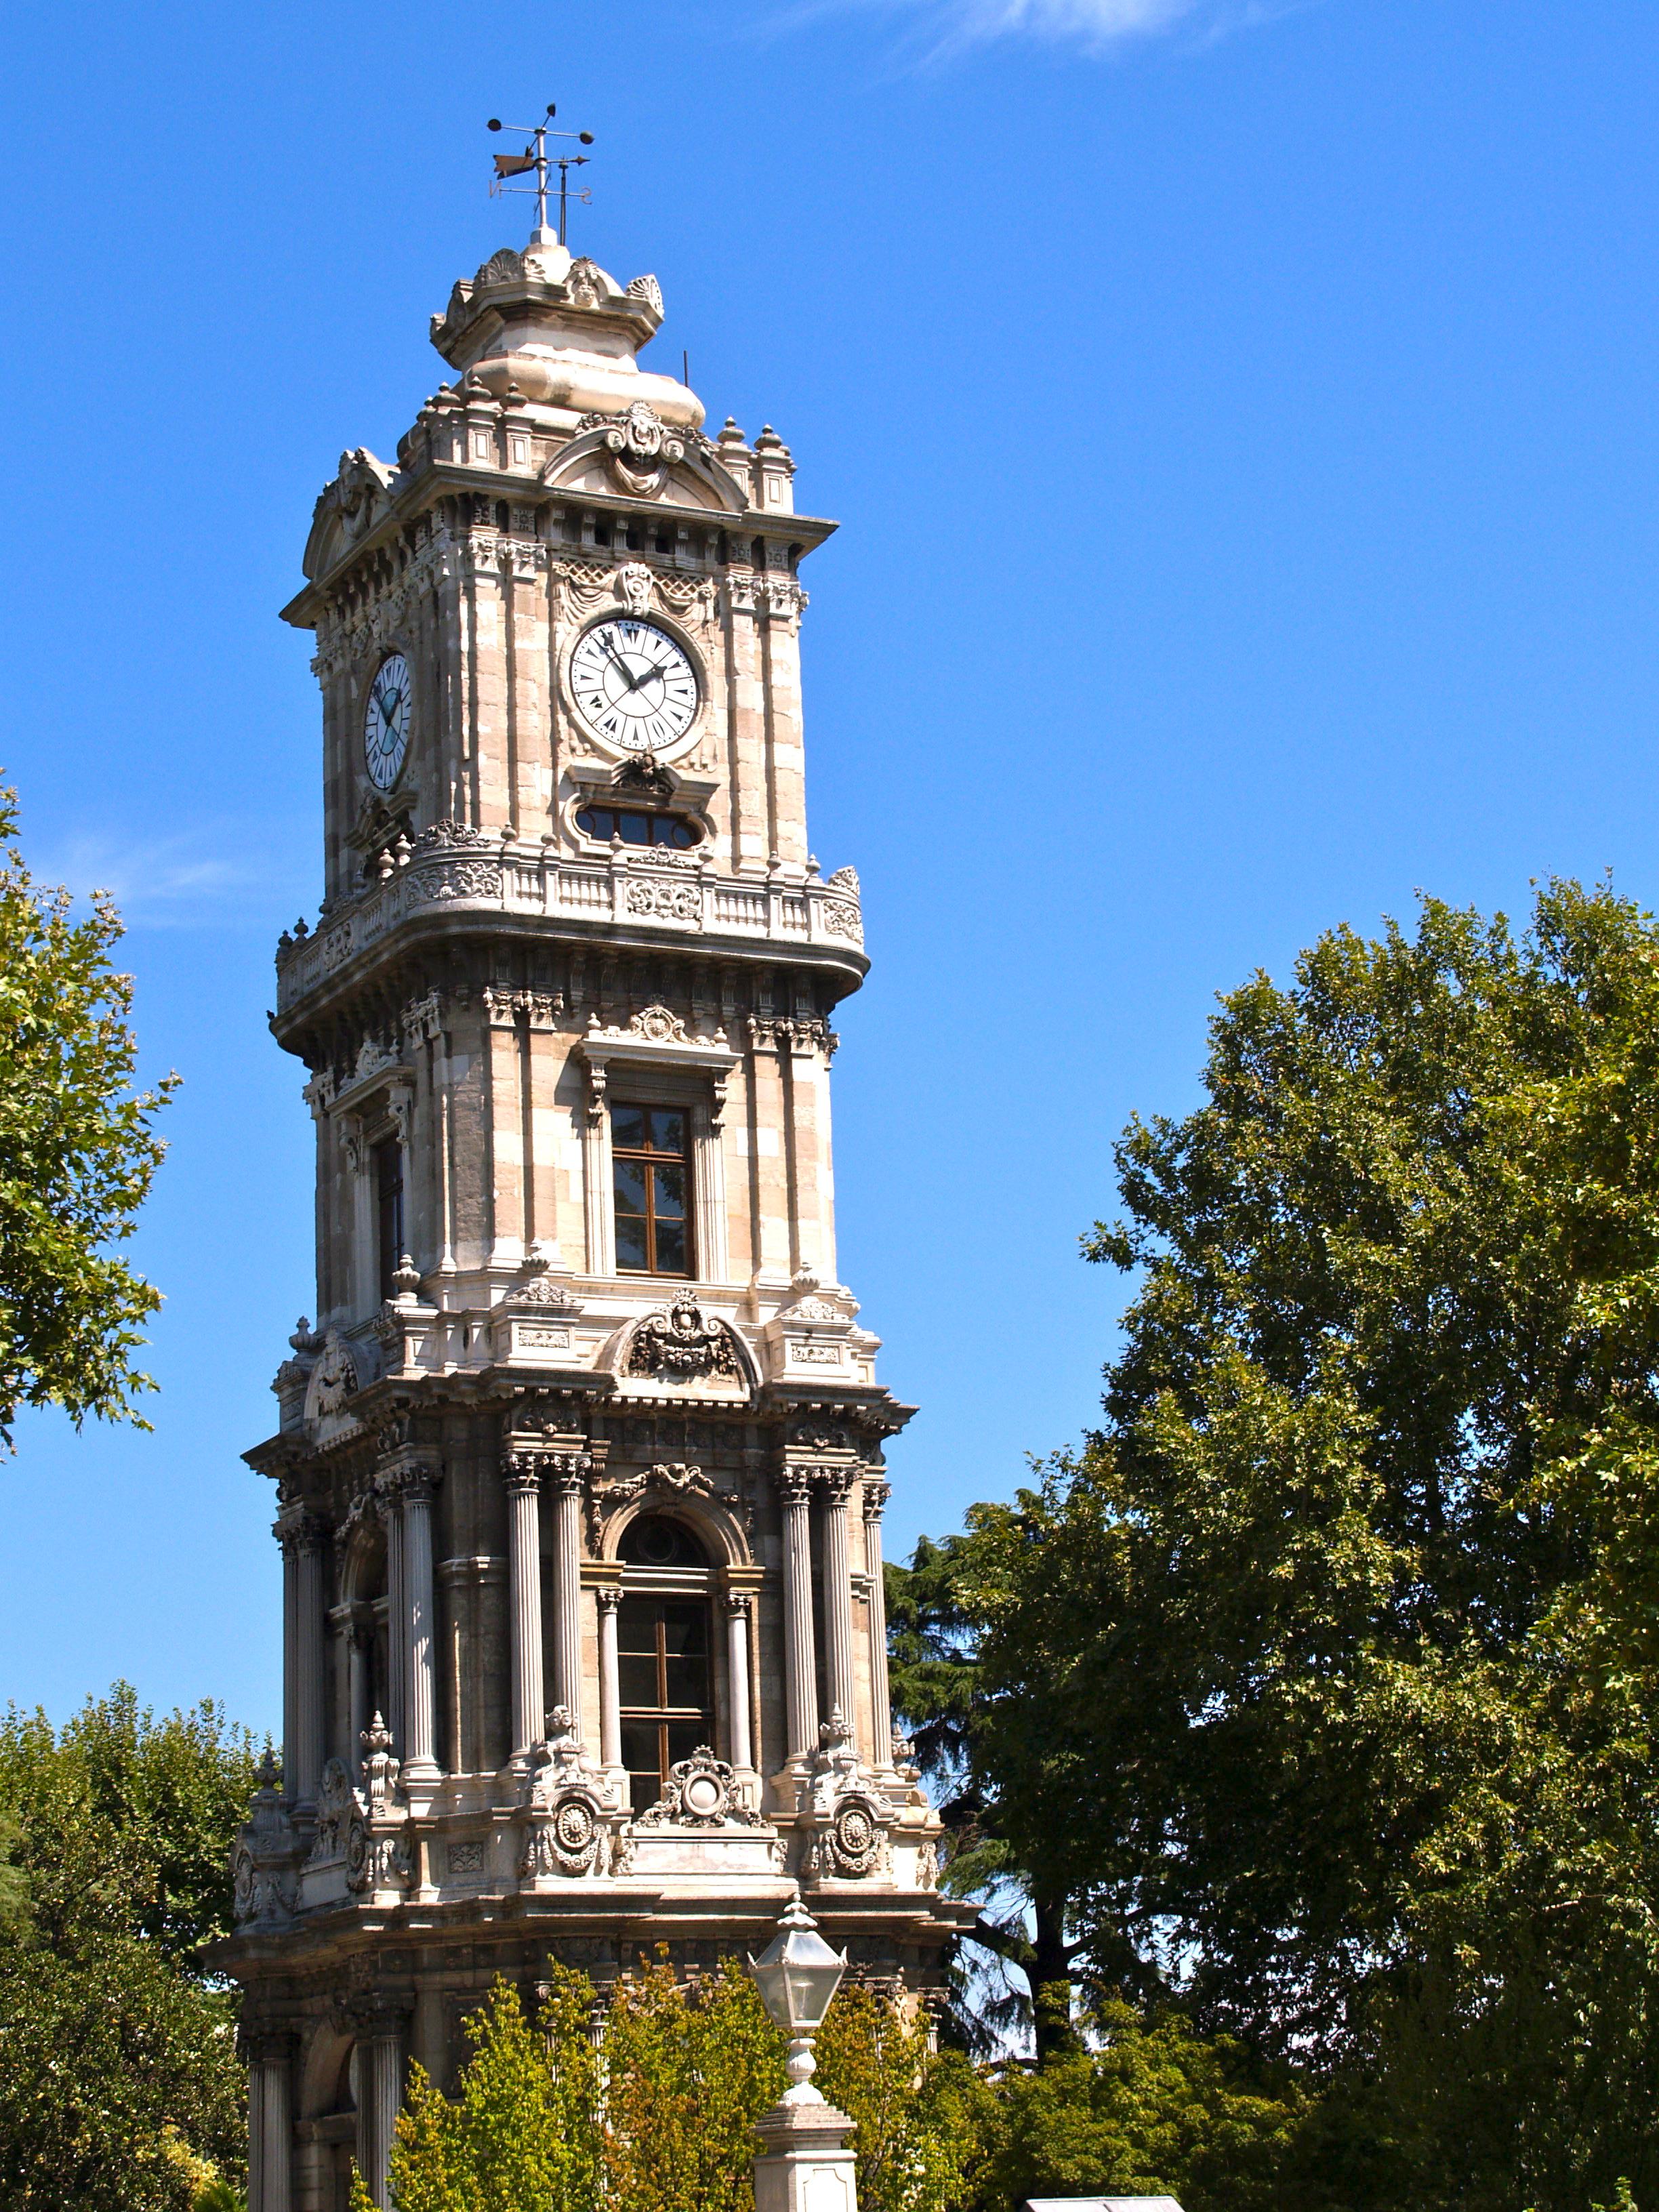 File:Turkey, Istanbul, Dolmabahçe Clock Tower.jpg ...